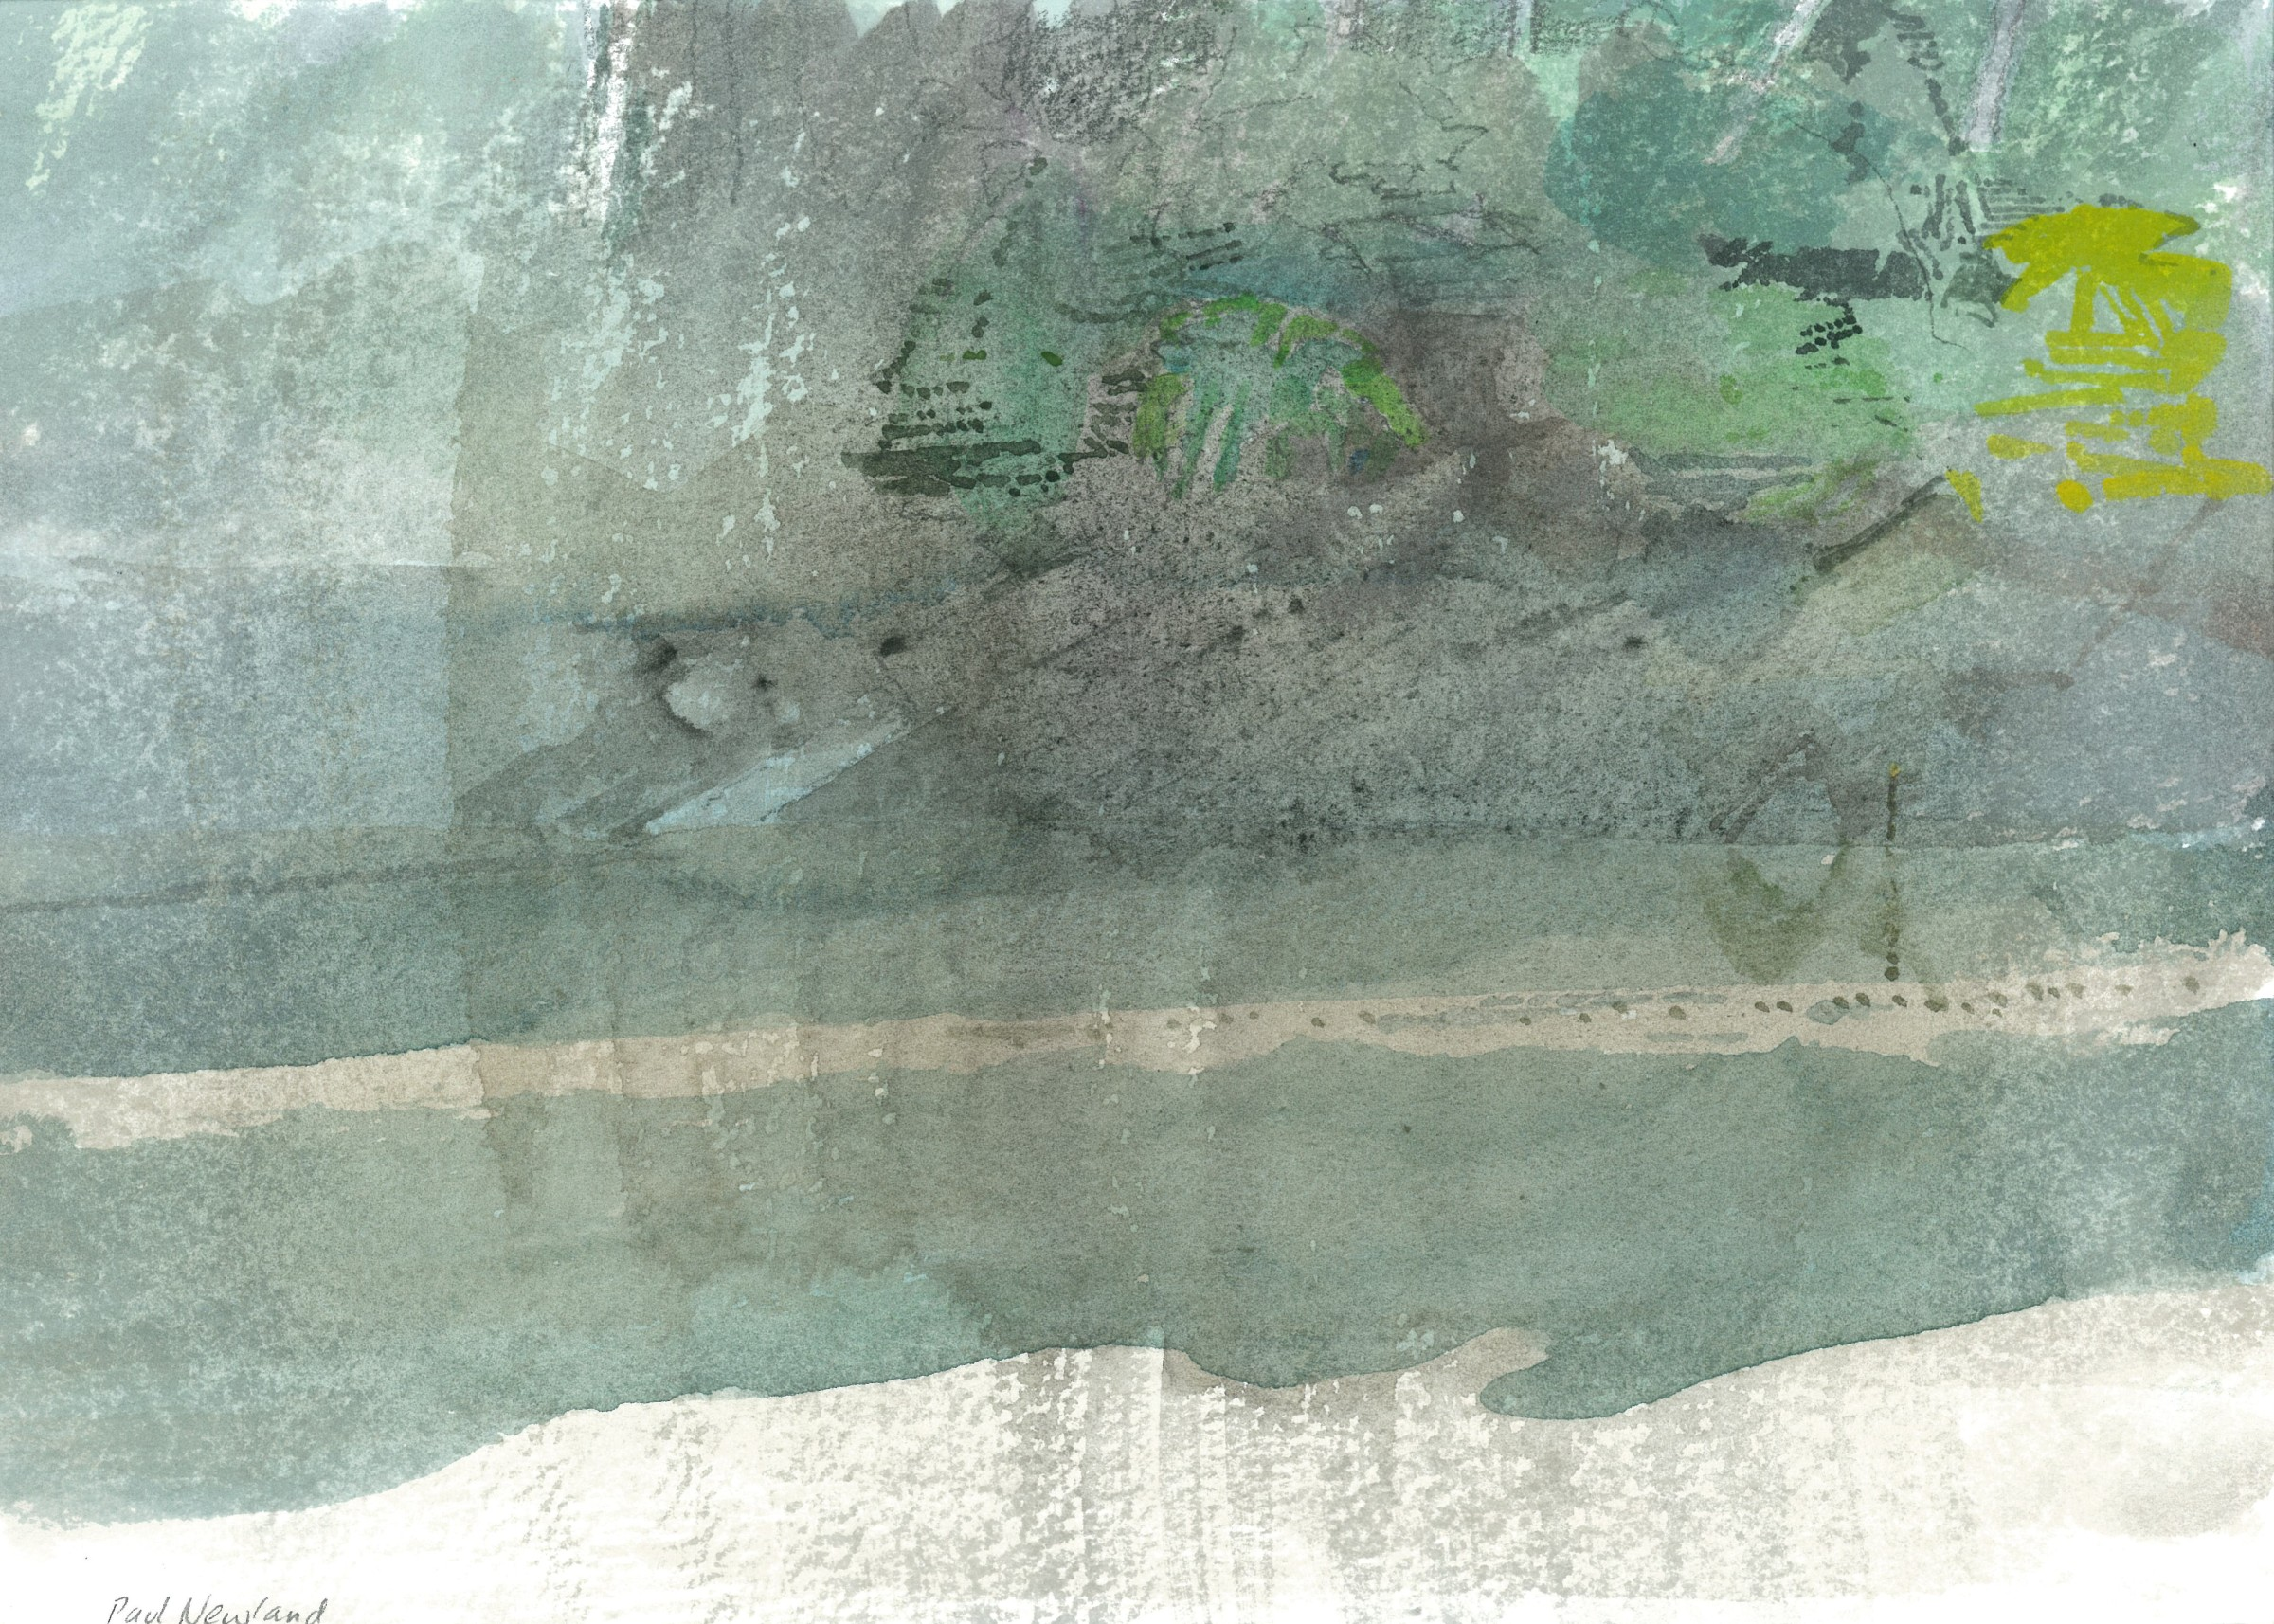 <span class=&#34;link fancybox-details-link&#34;><a href=&#34;/artists/87-paul-newland/works/10220-paul-newland-river-avon-below-bristol/&#34;>View Detail Page</a></span><div class=&#34;artist&#34;><span class=&#34;artist&#34;><strong>Paul Newland</strong></span></div><div class=&#34;title&#34;><em>River Avon Below Bristol</em></div><div class=&#34;medium&#34;>Watercolour</div><div class=&#34;dimensions&#34;>45cm x 38cm</div>